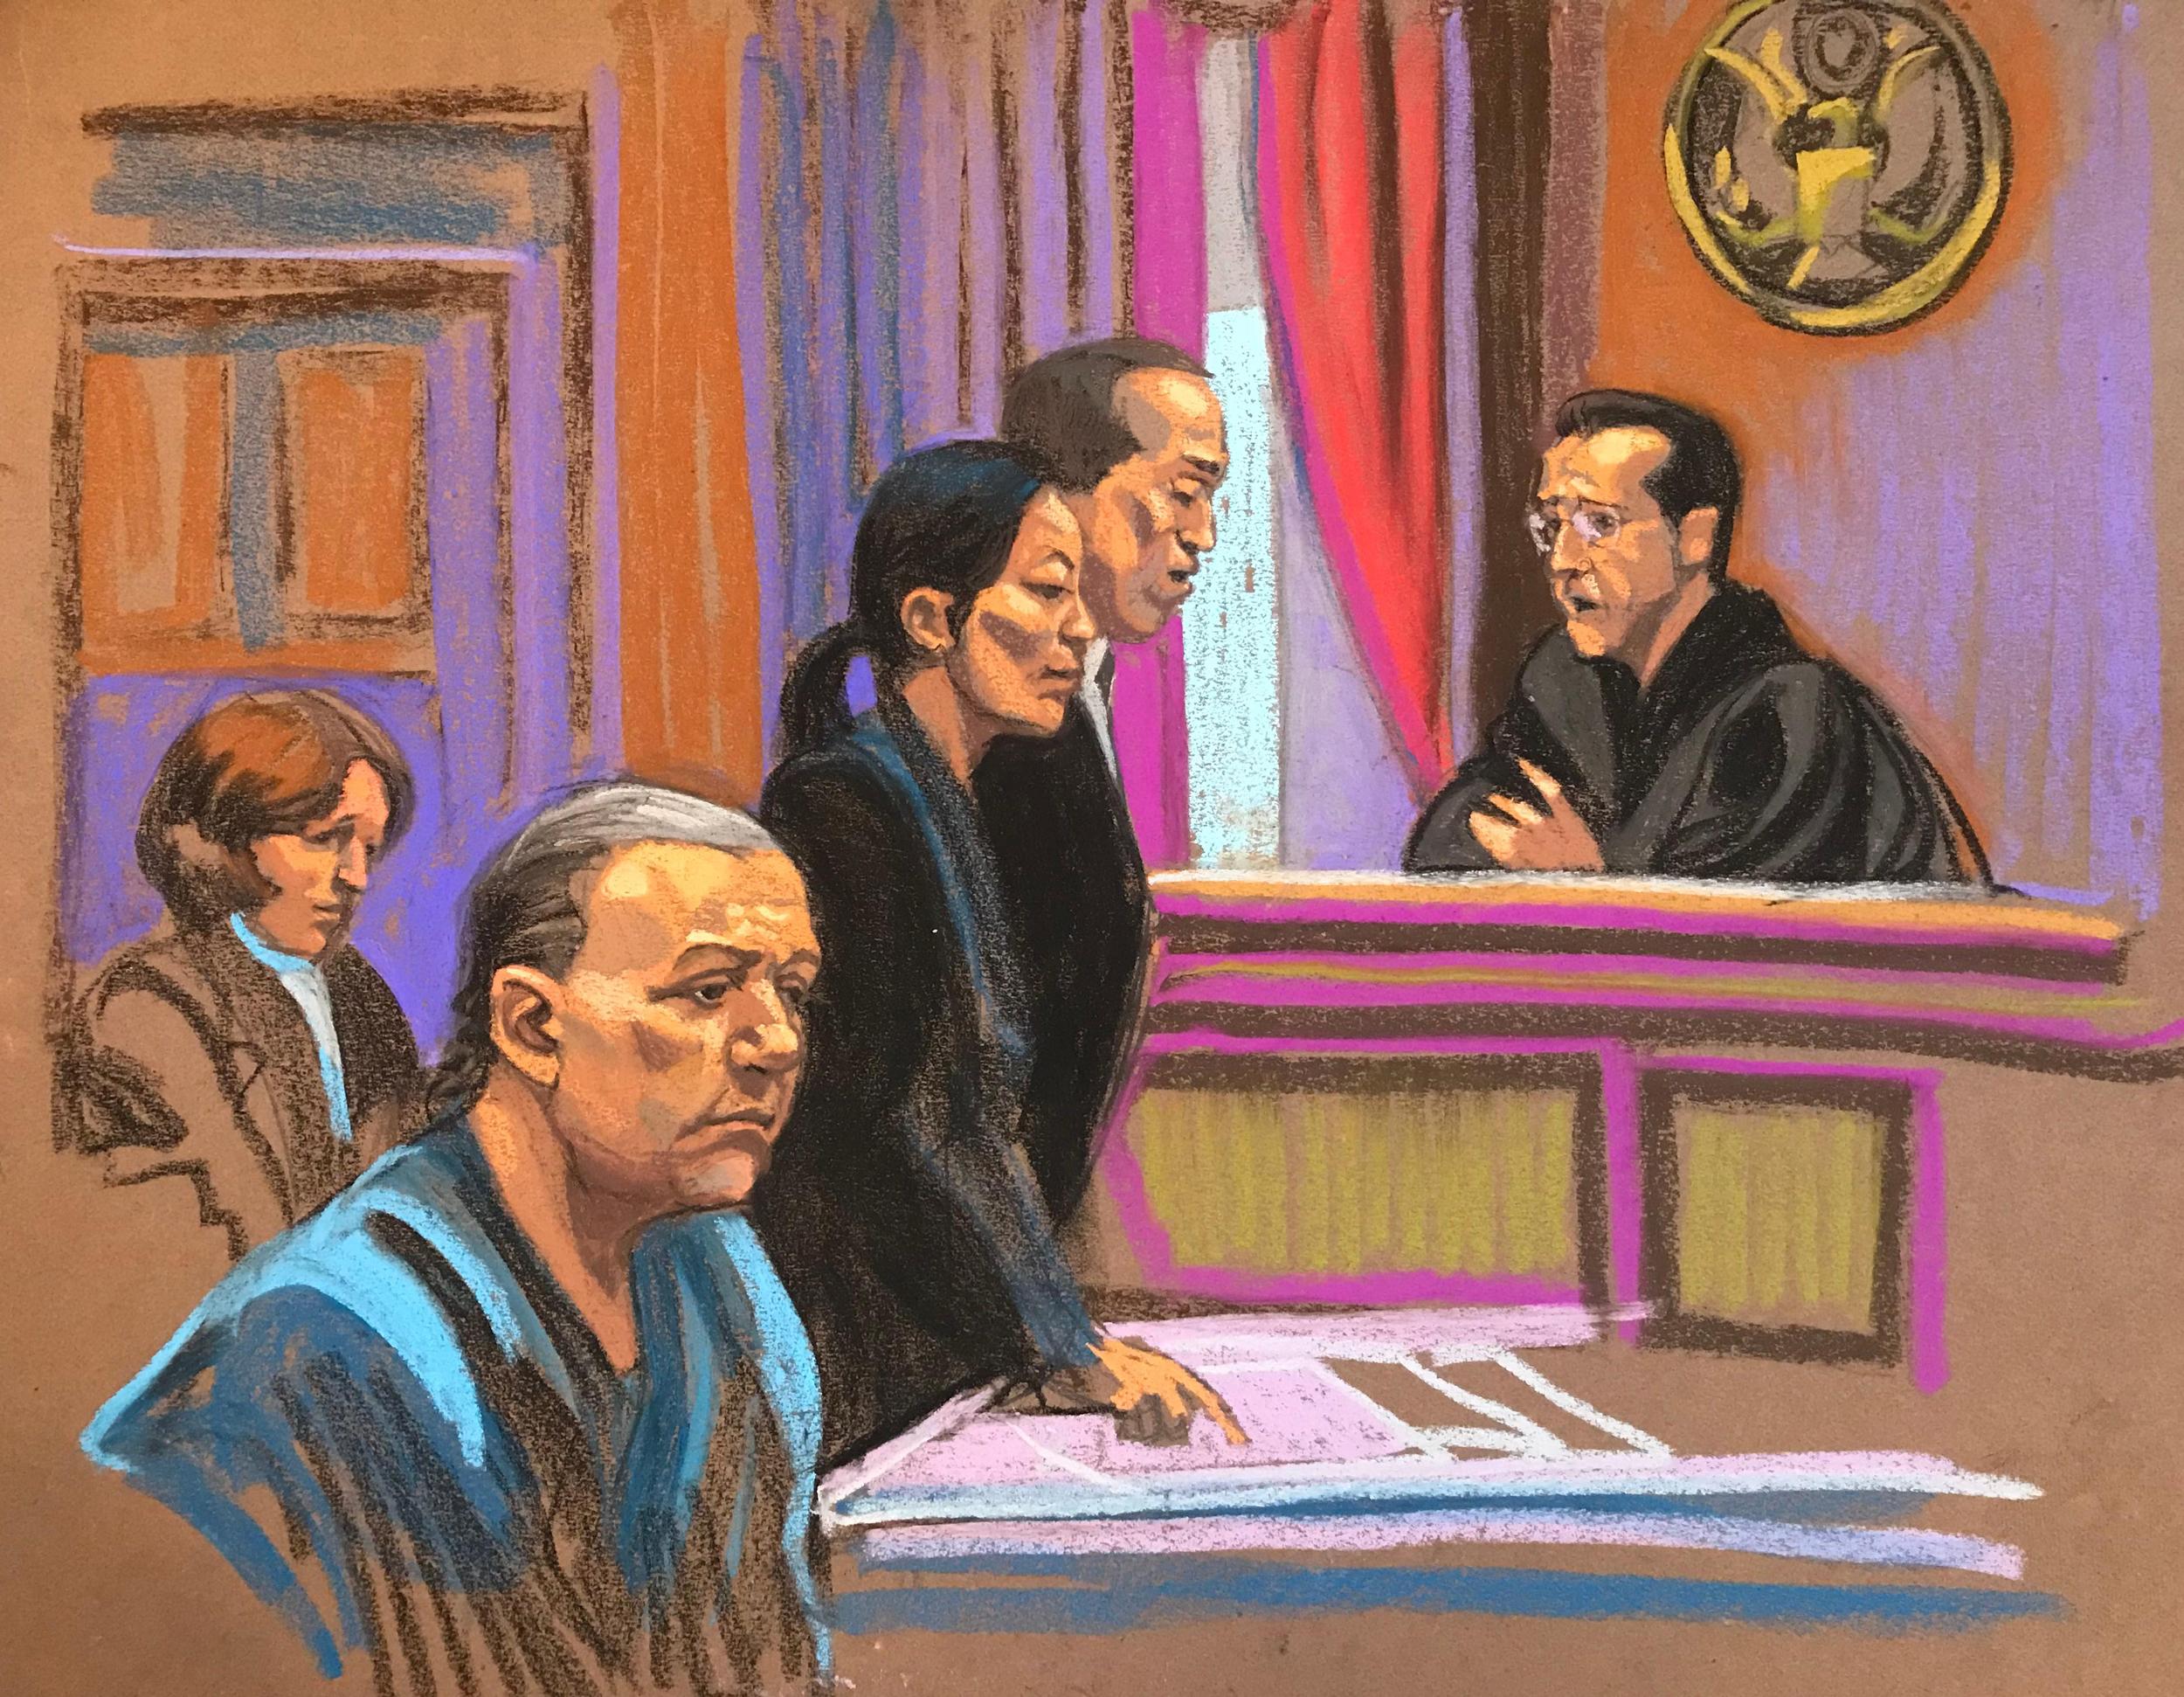 Mail bomb suspect Cesar Sayoc to plead guilty in spree targeting Obama, De Niro, CNN